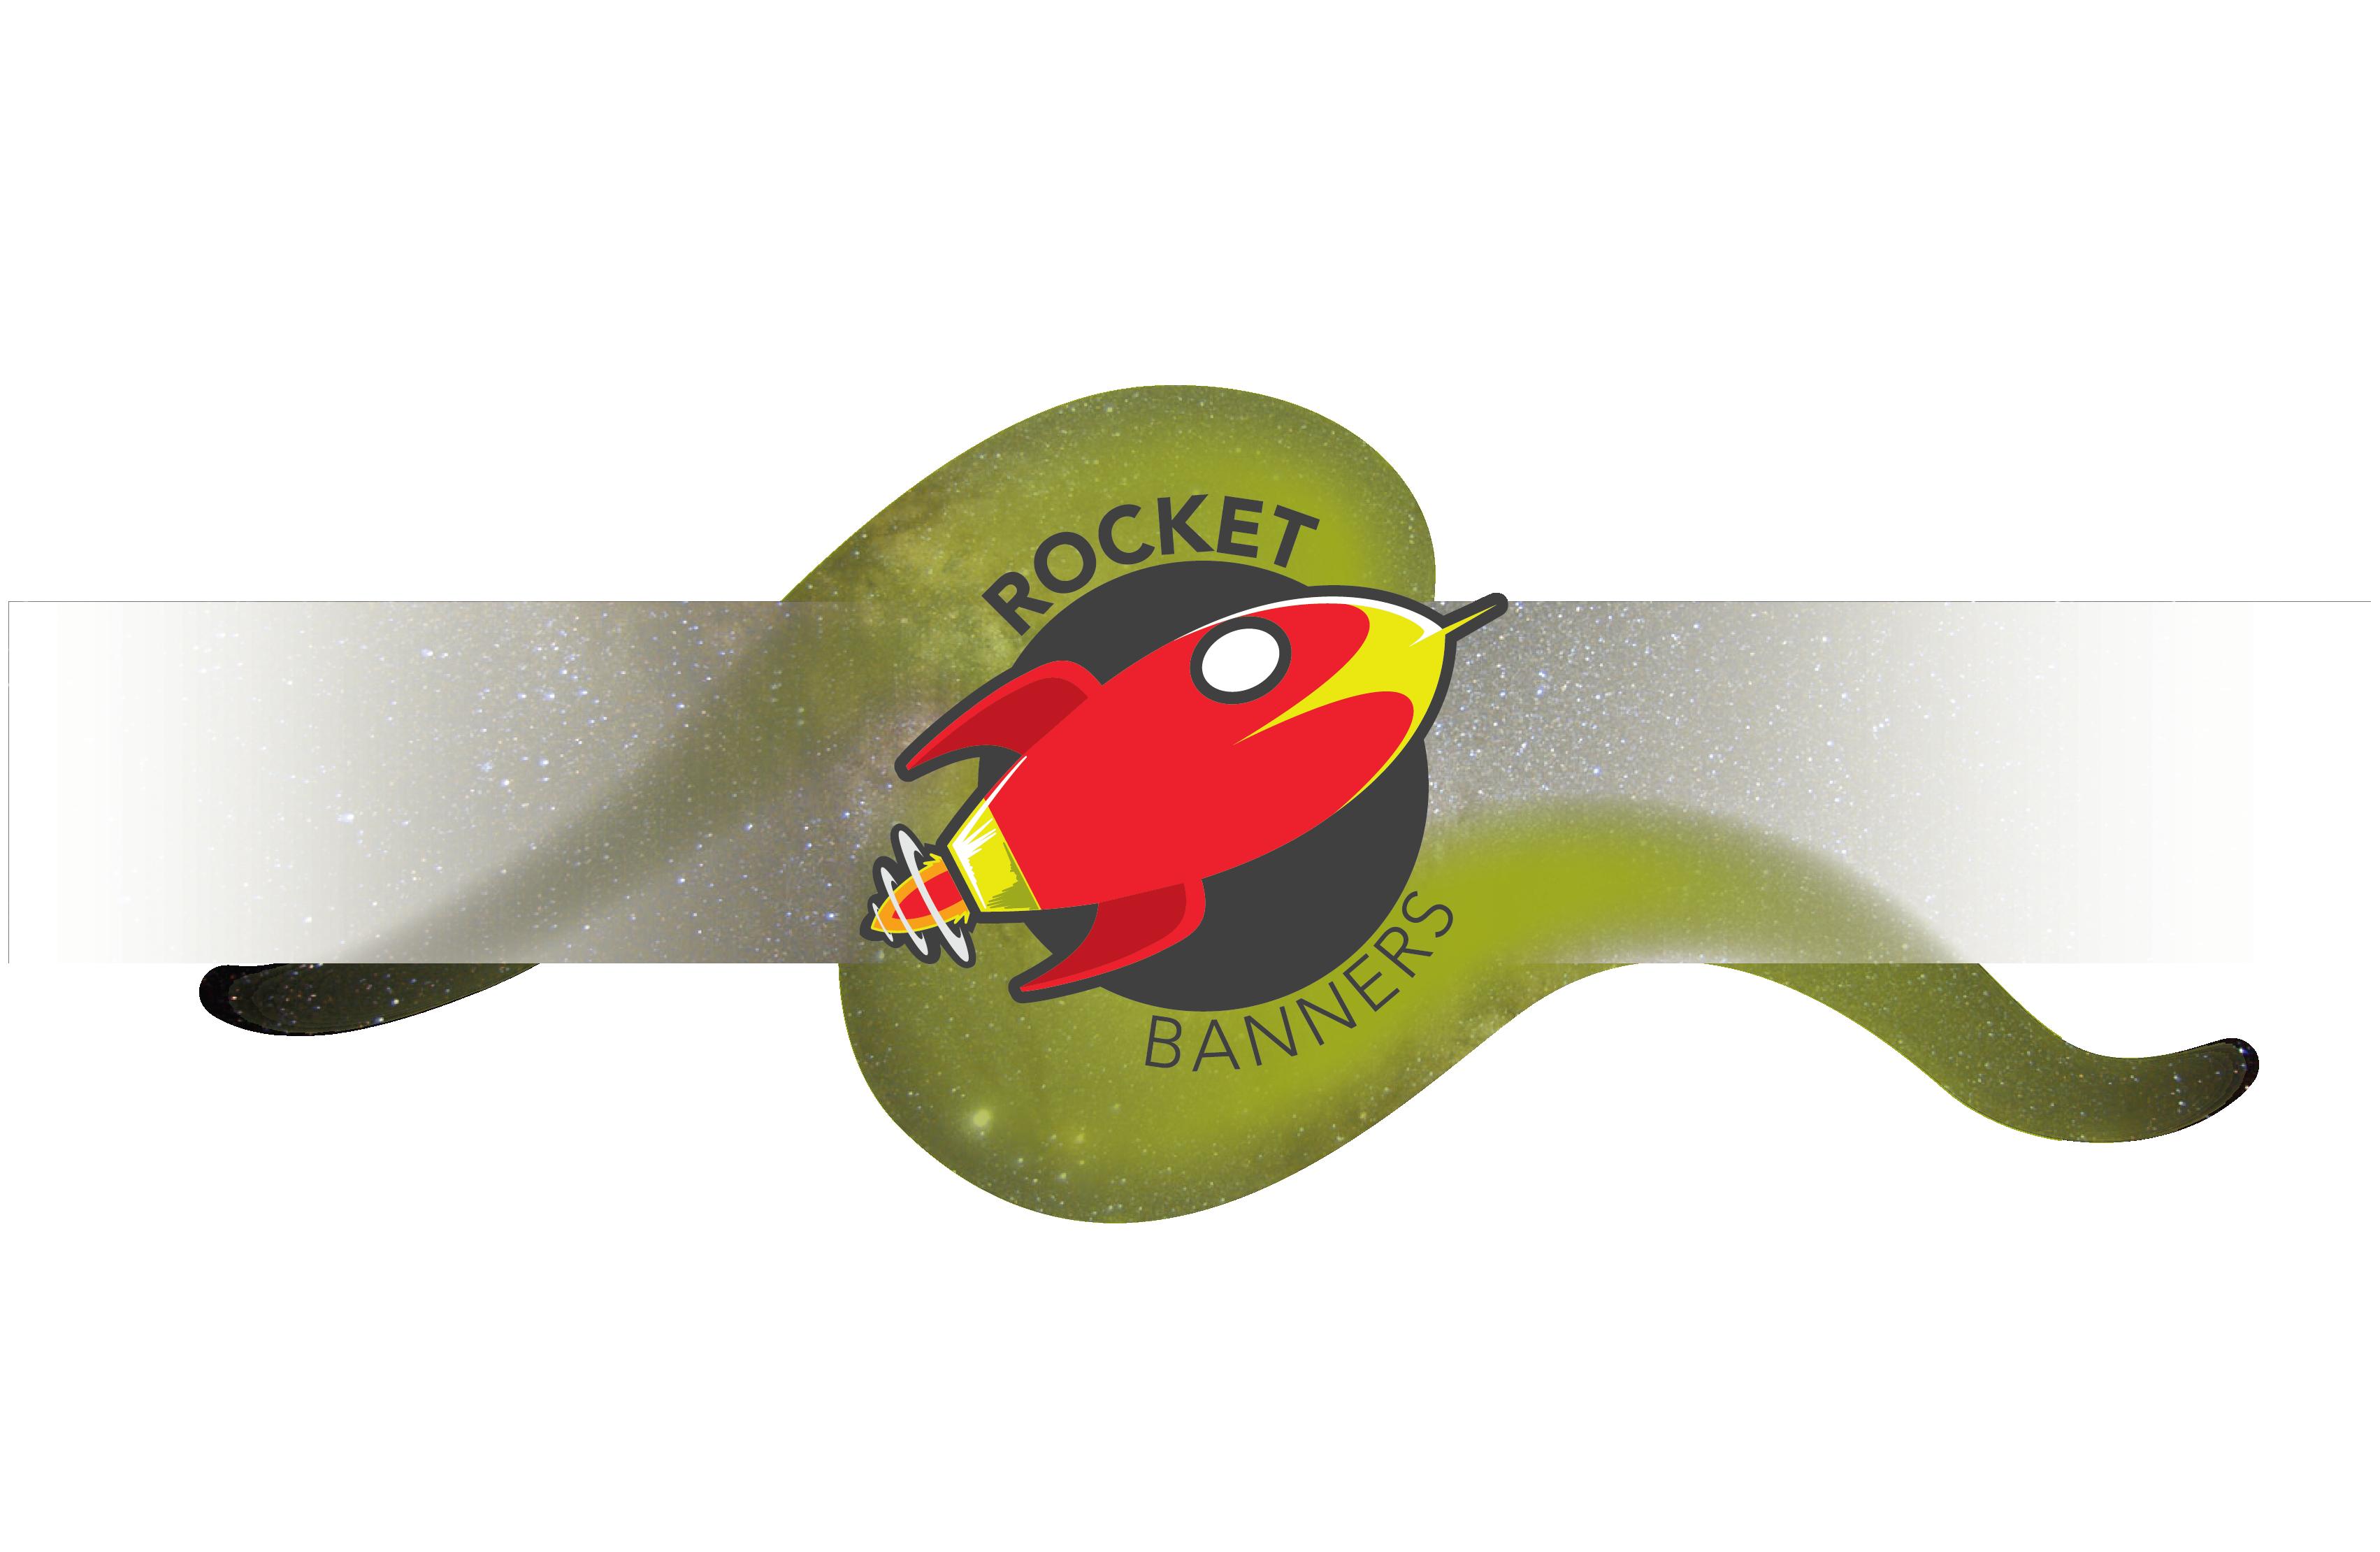 Rocket Banners